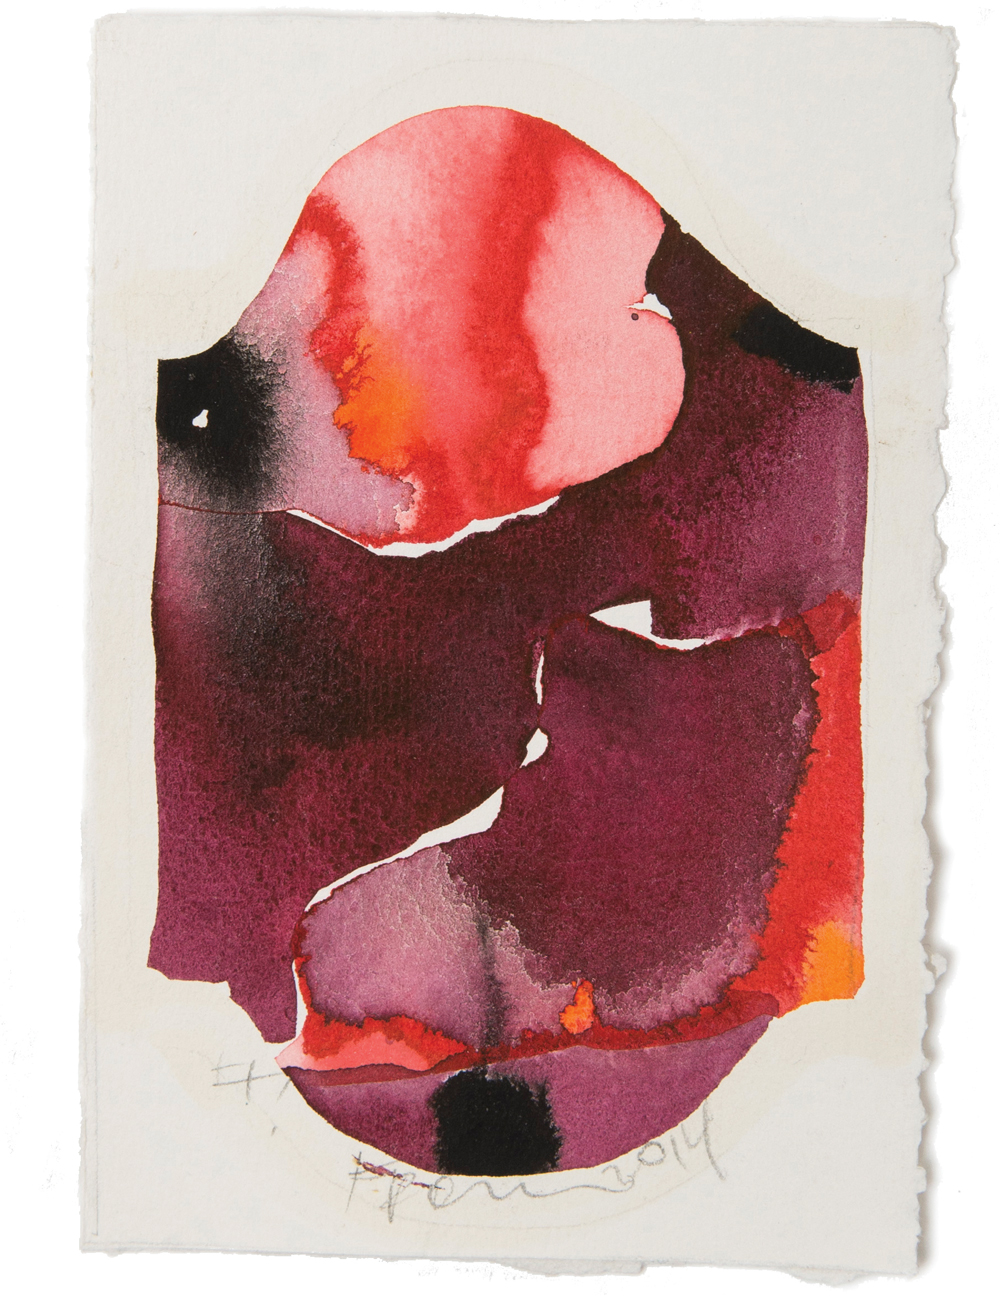 Painting by Kate Roebuck